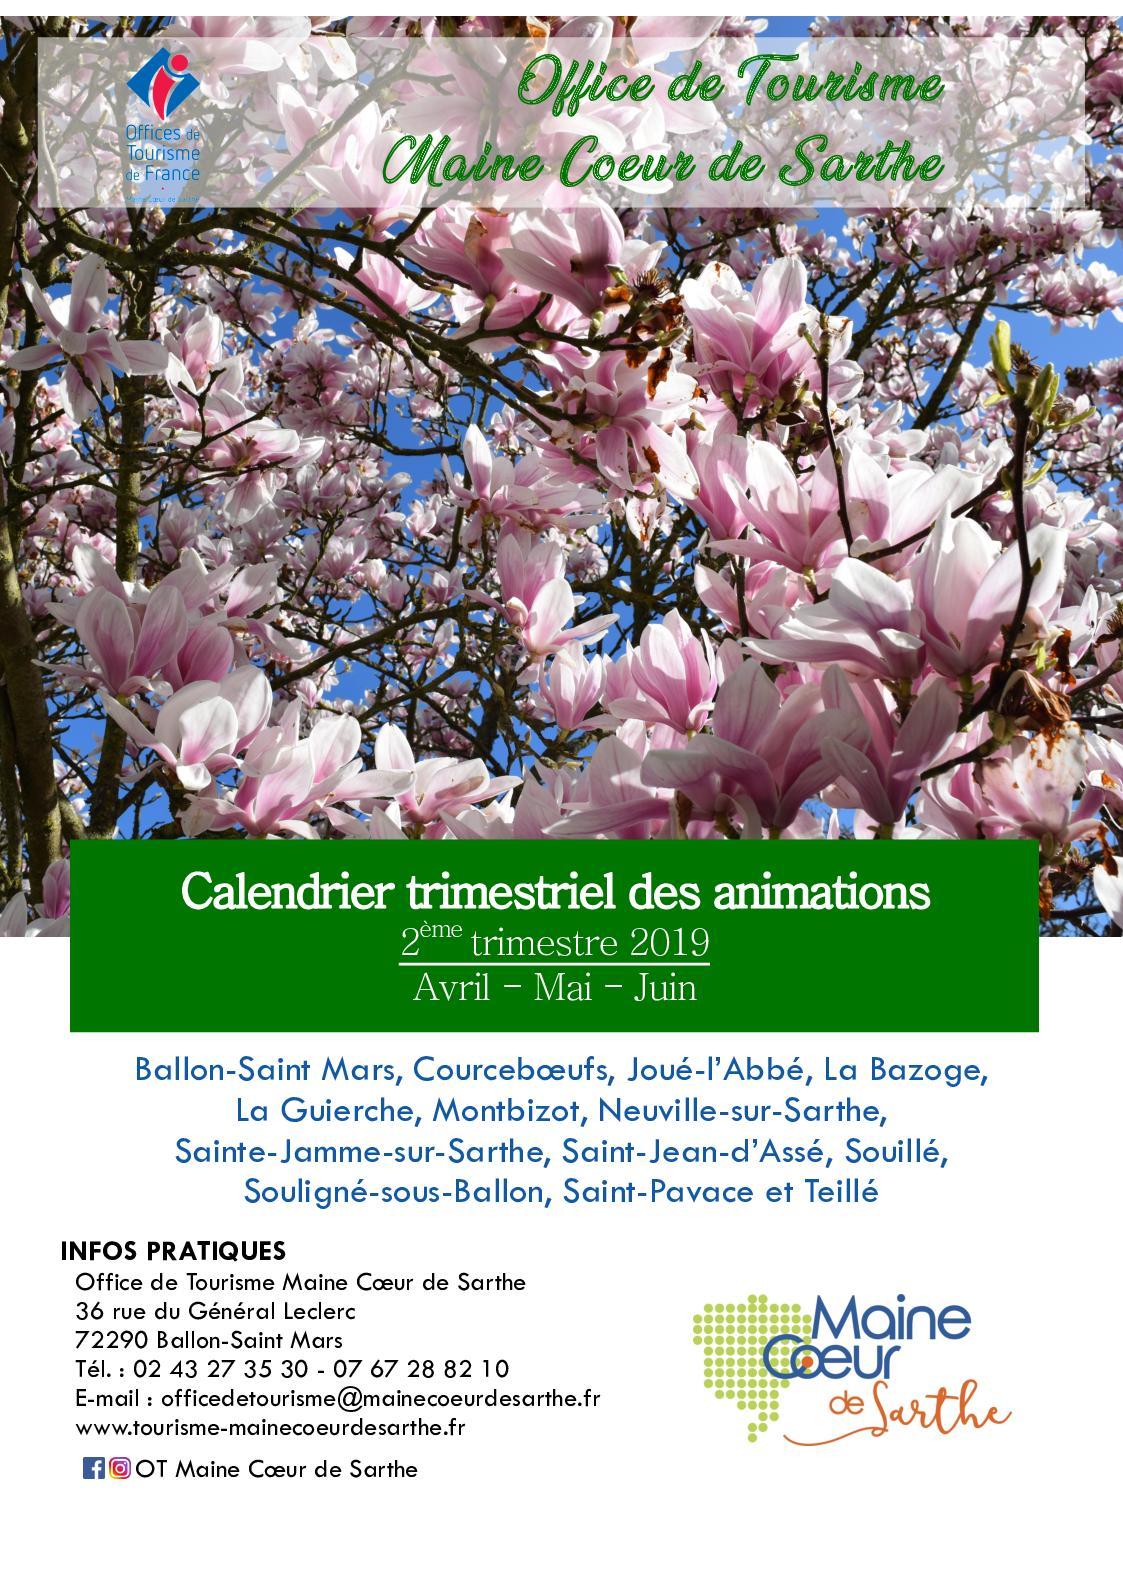 Calendrier Comice Agricole Sarthe 2019.Calameo Calendrier Trimestriel 2e Trimestre 2019